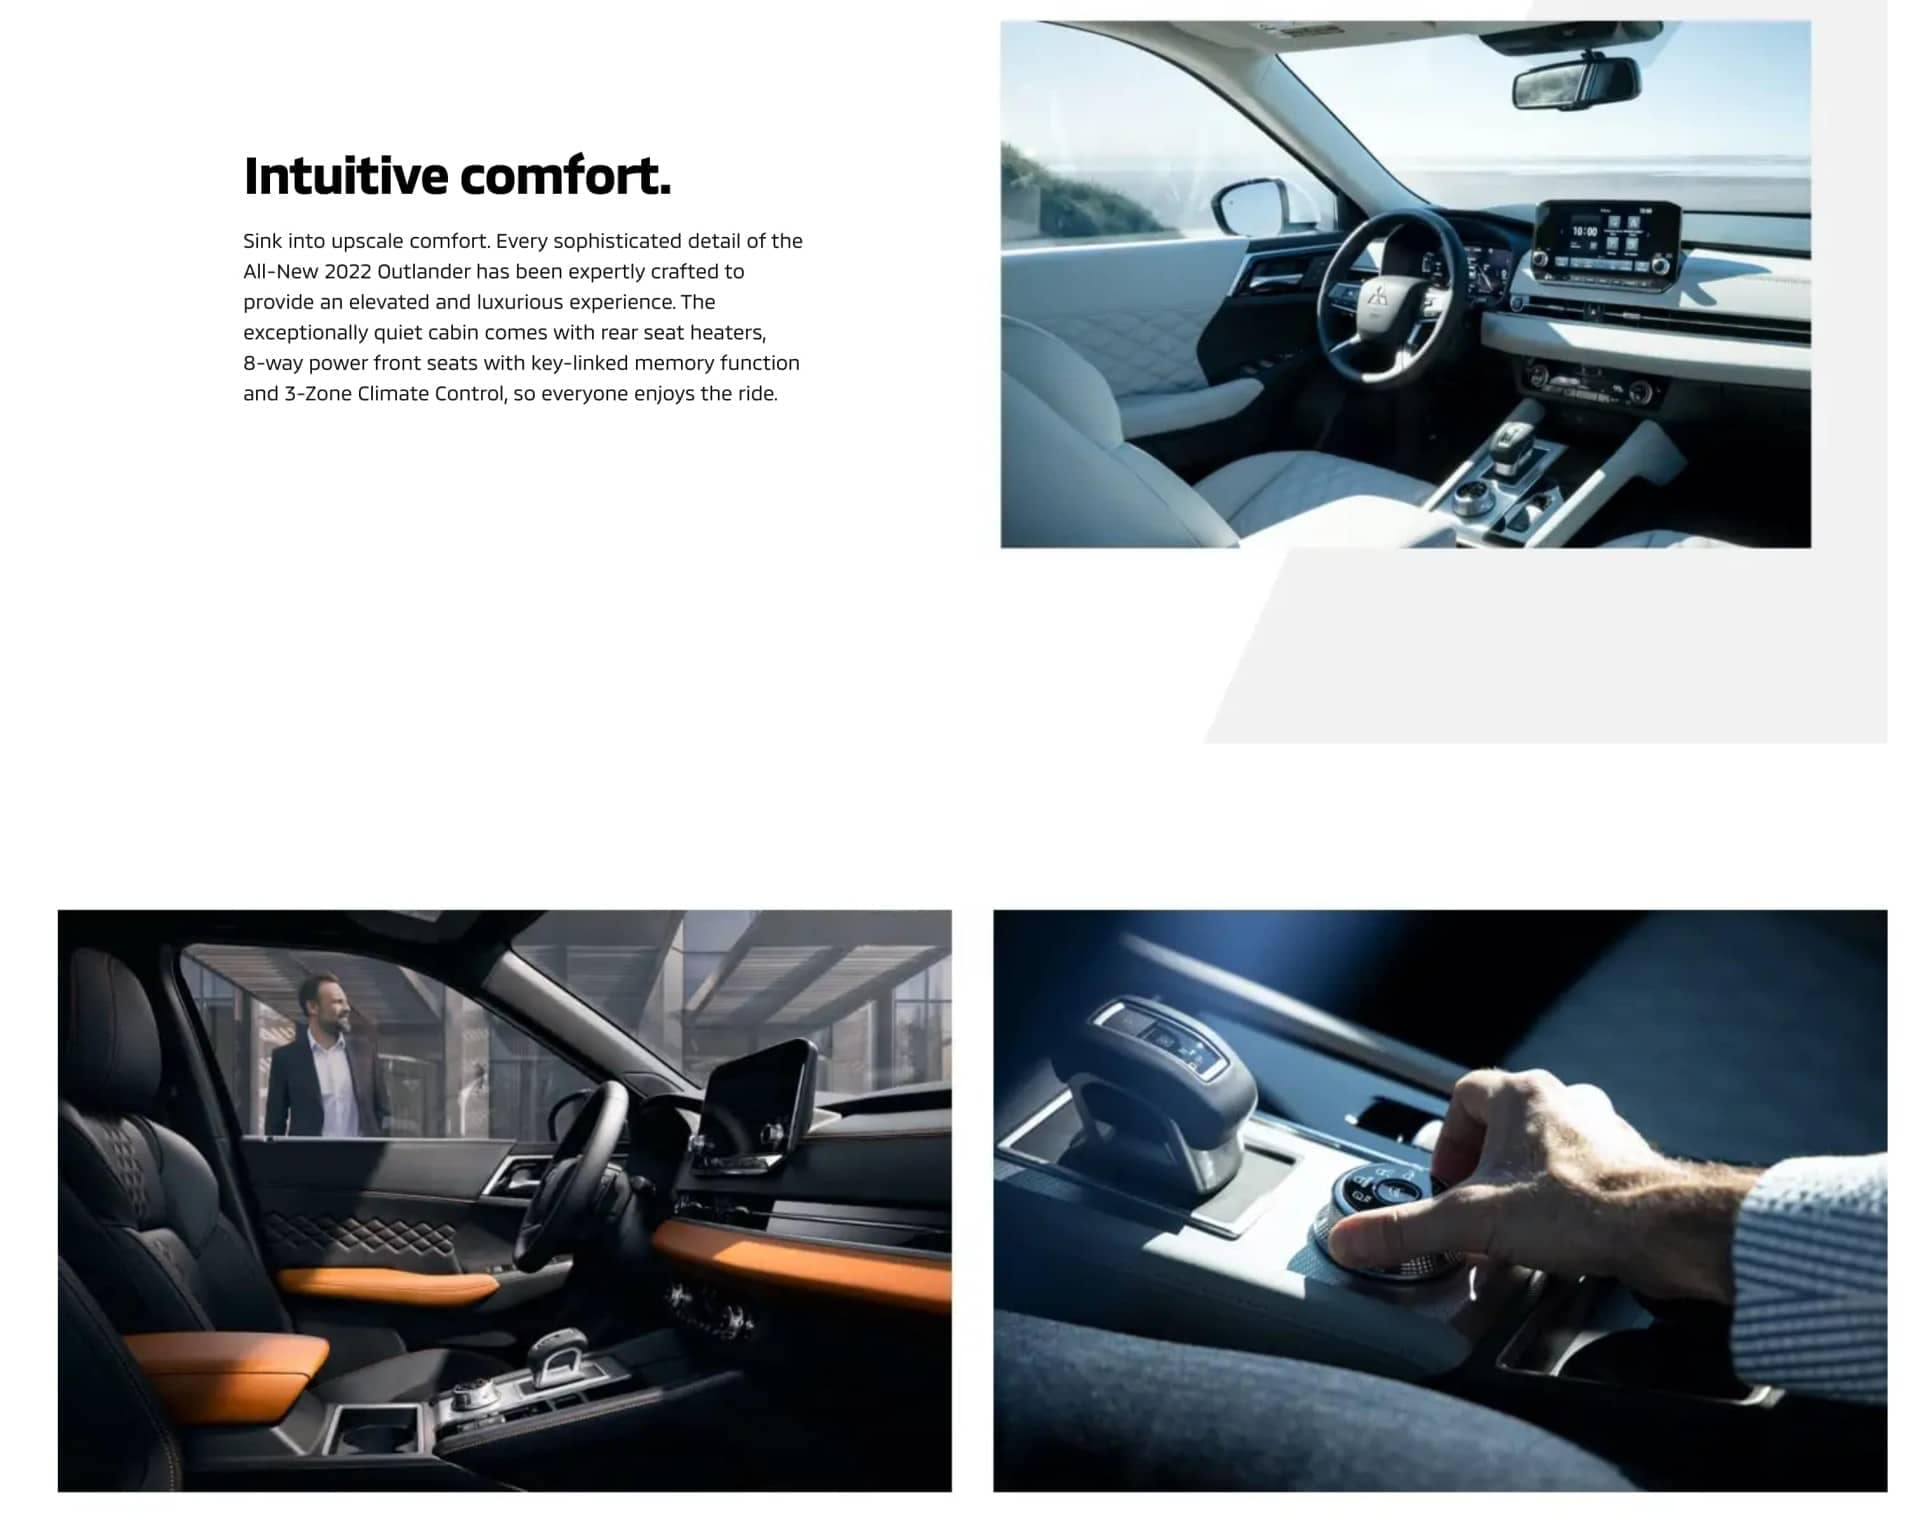 2022 Mitsubishi Outlander Intuitive Comfort